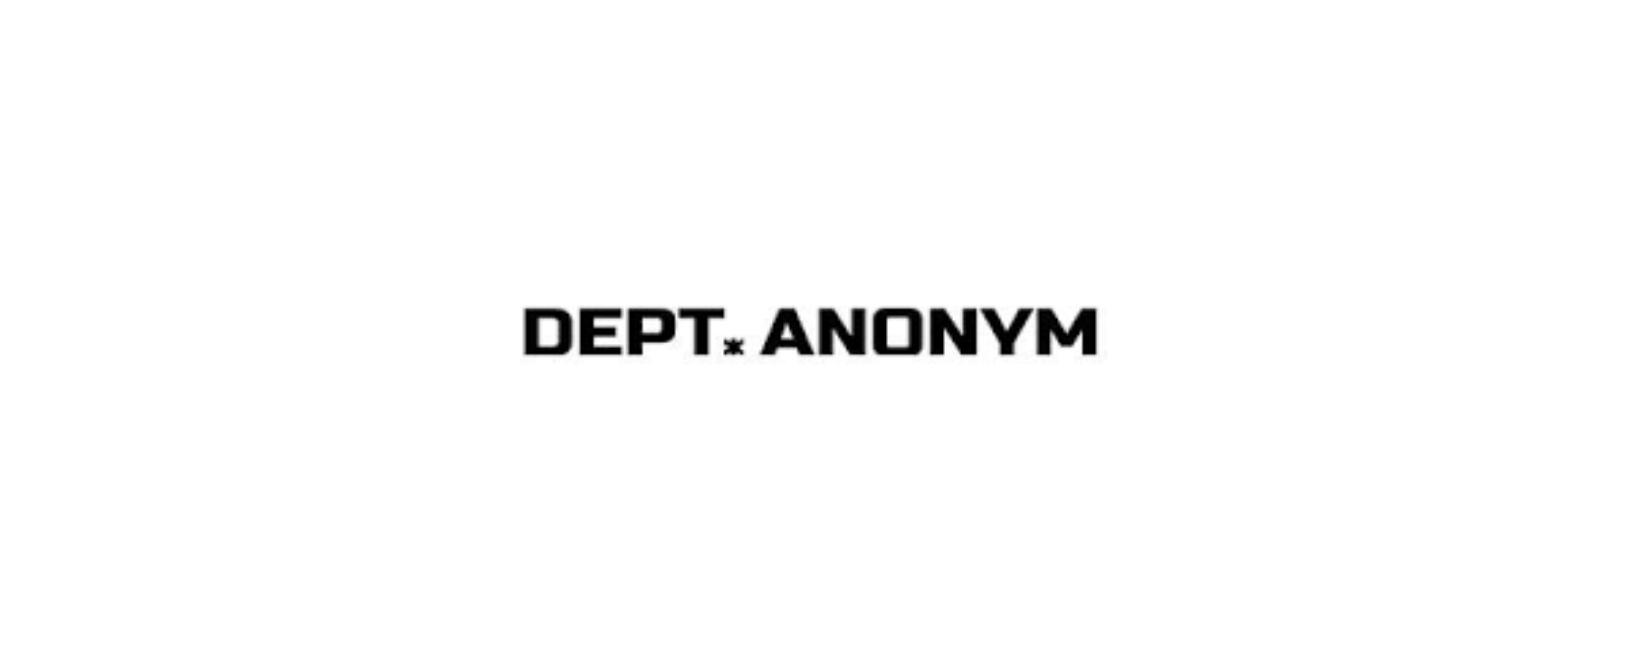 Deptanonym Discount Code 2021